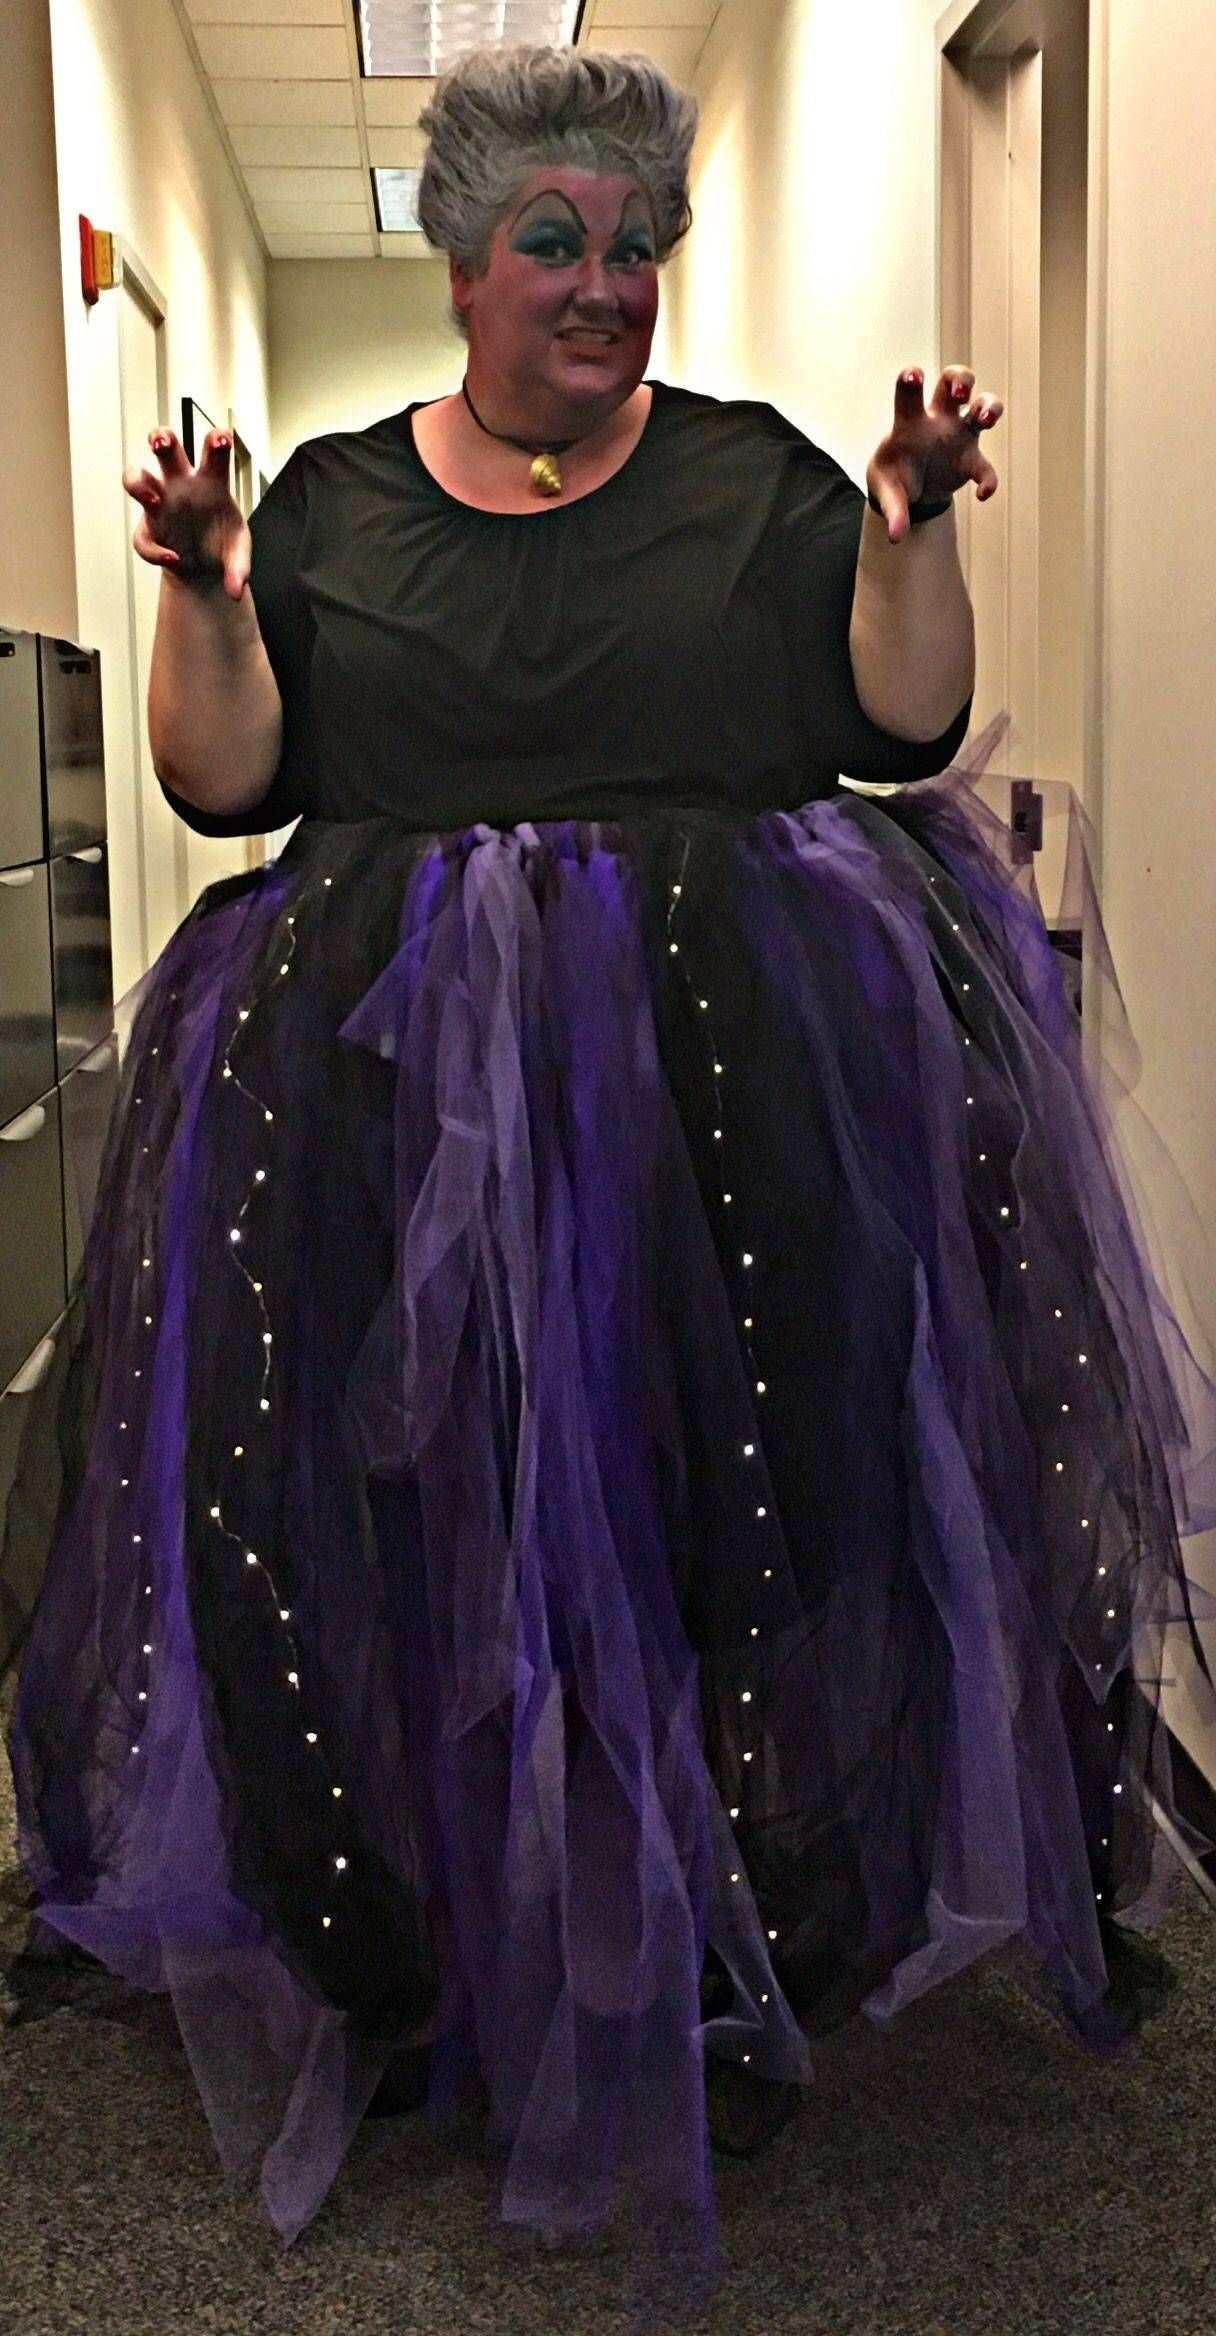 Disney Villain Halloween Costumes Diy.Image Result For Diy Ursula Costume Halloween Ursala Costume